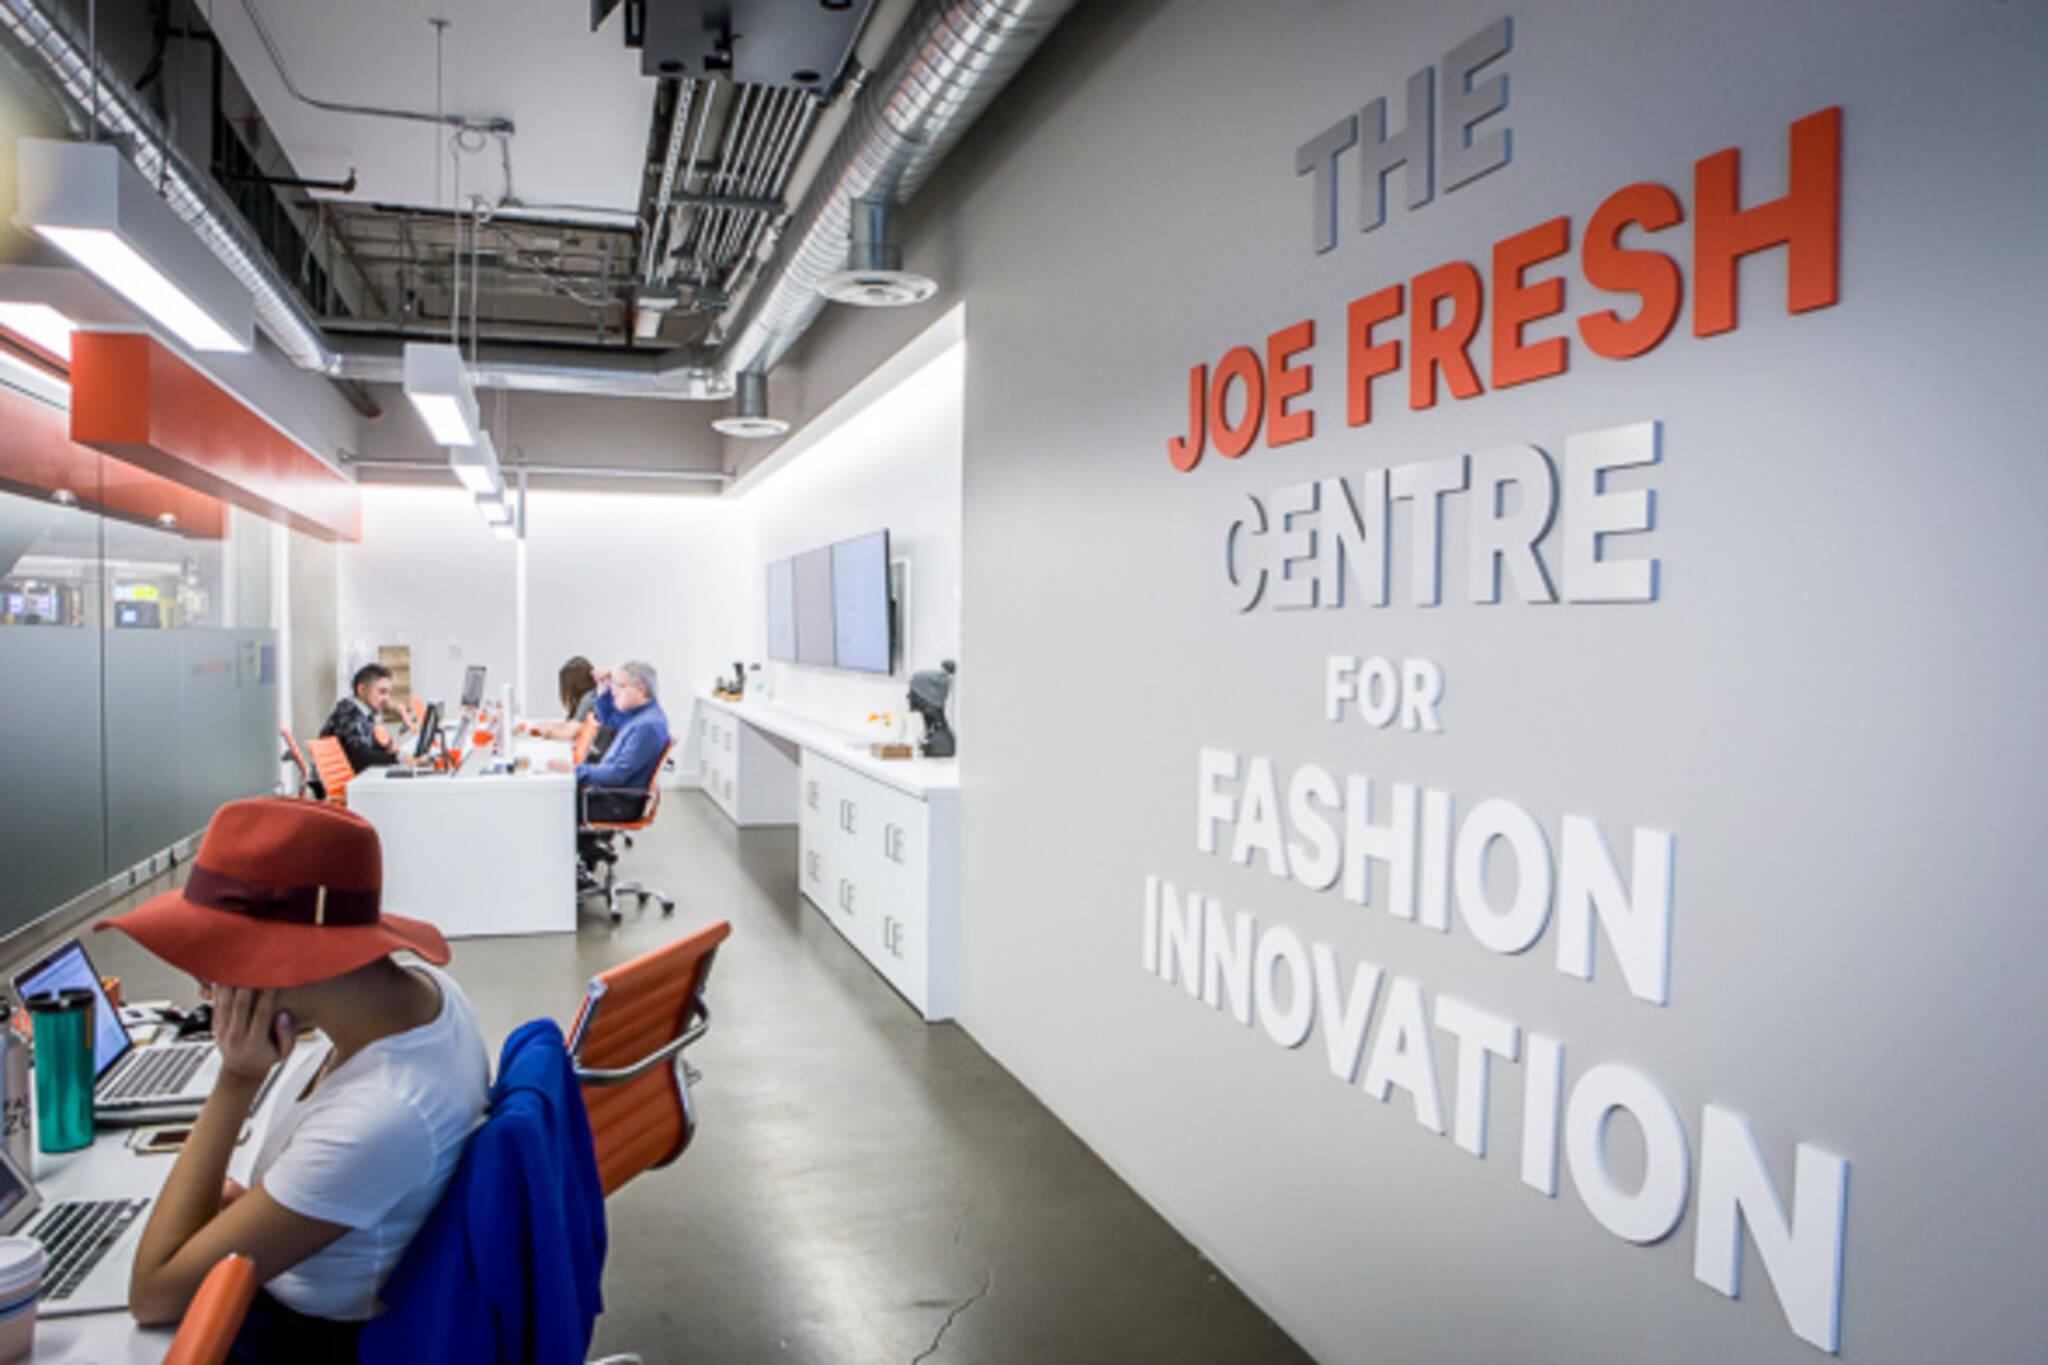 Joe Fresh Centre for Fashion Innovation